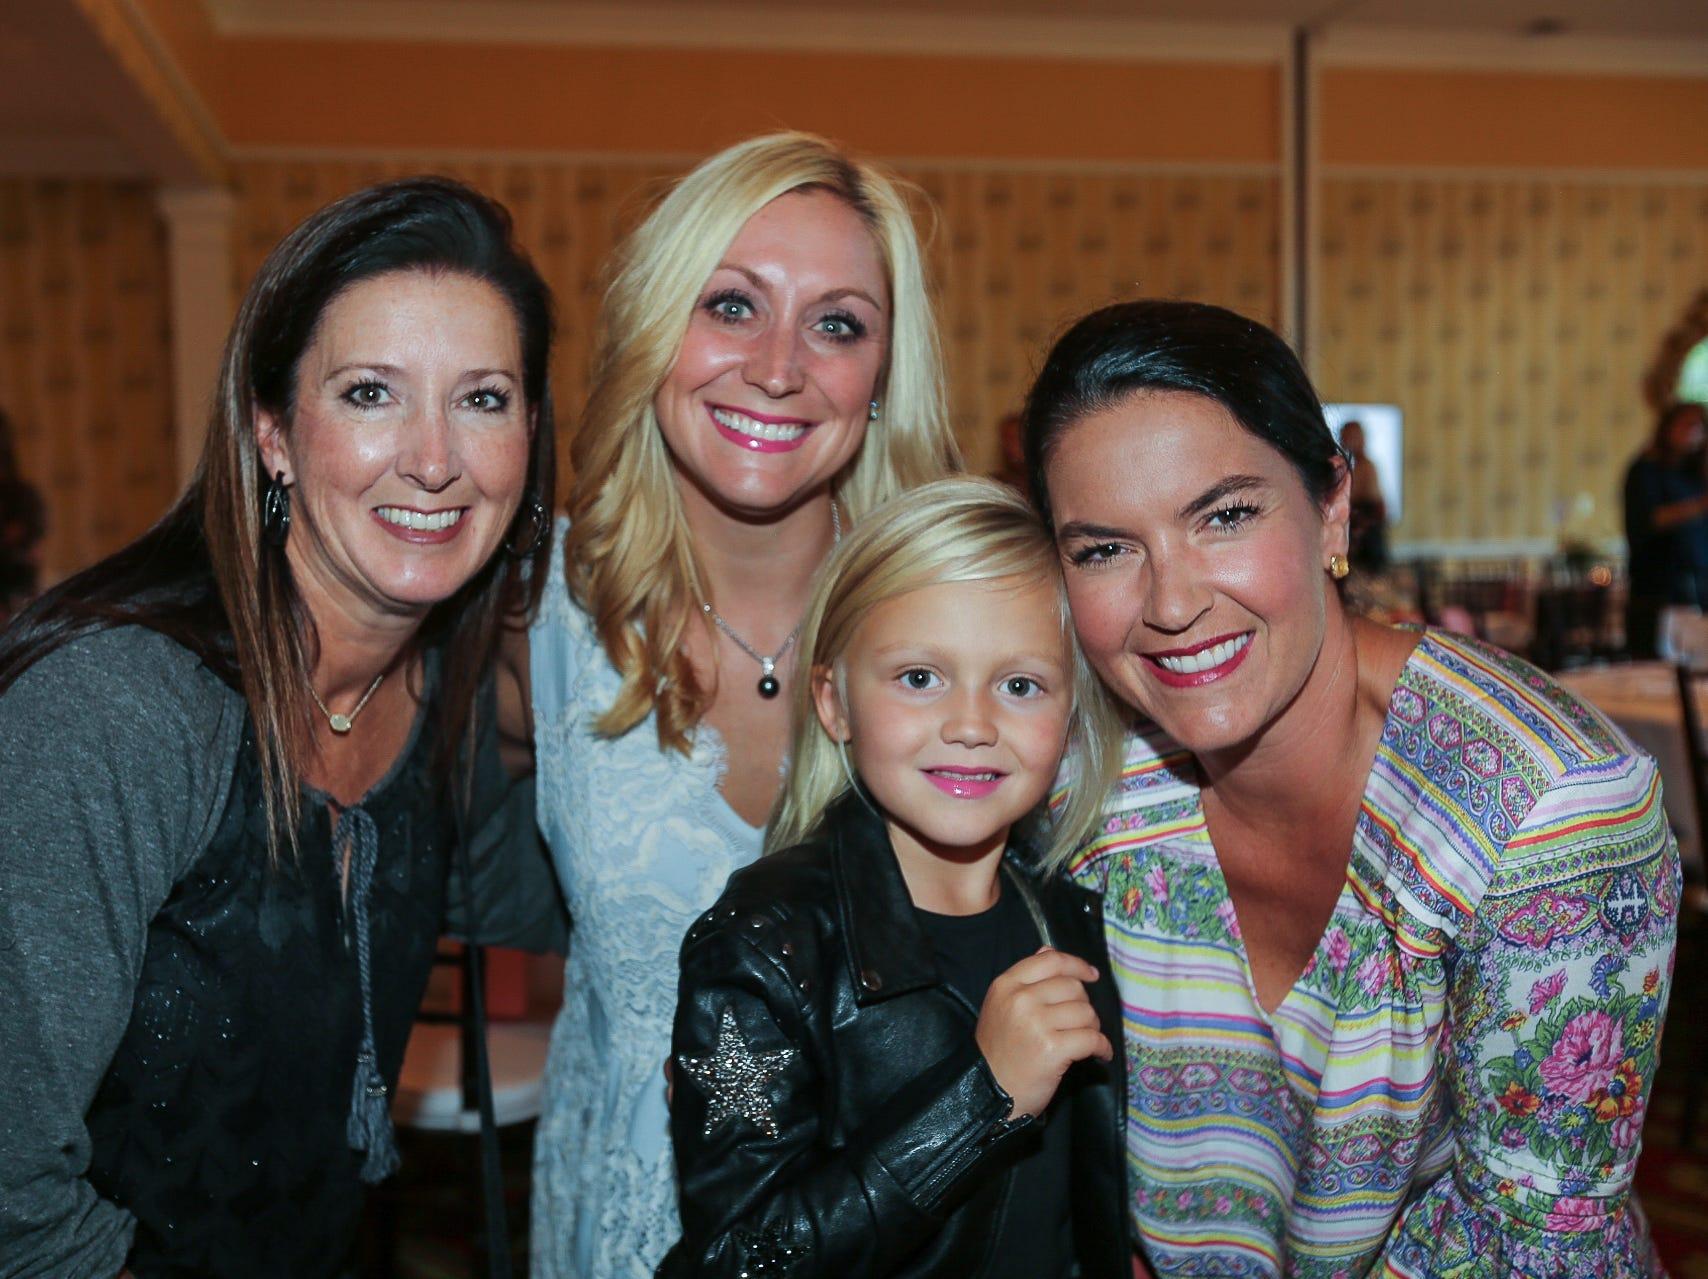 Natalie Walters and Brandi, Clara, and Brooke O'Reilly